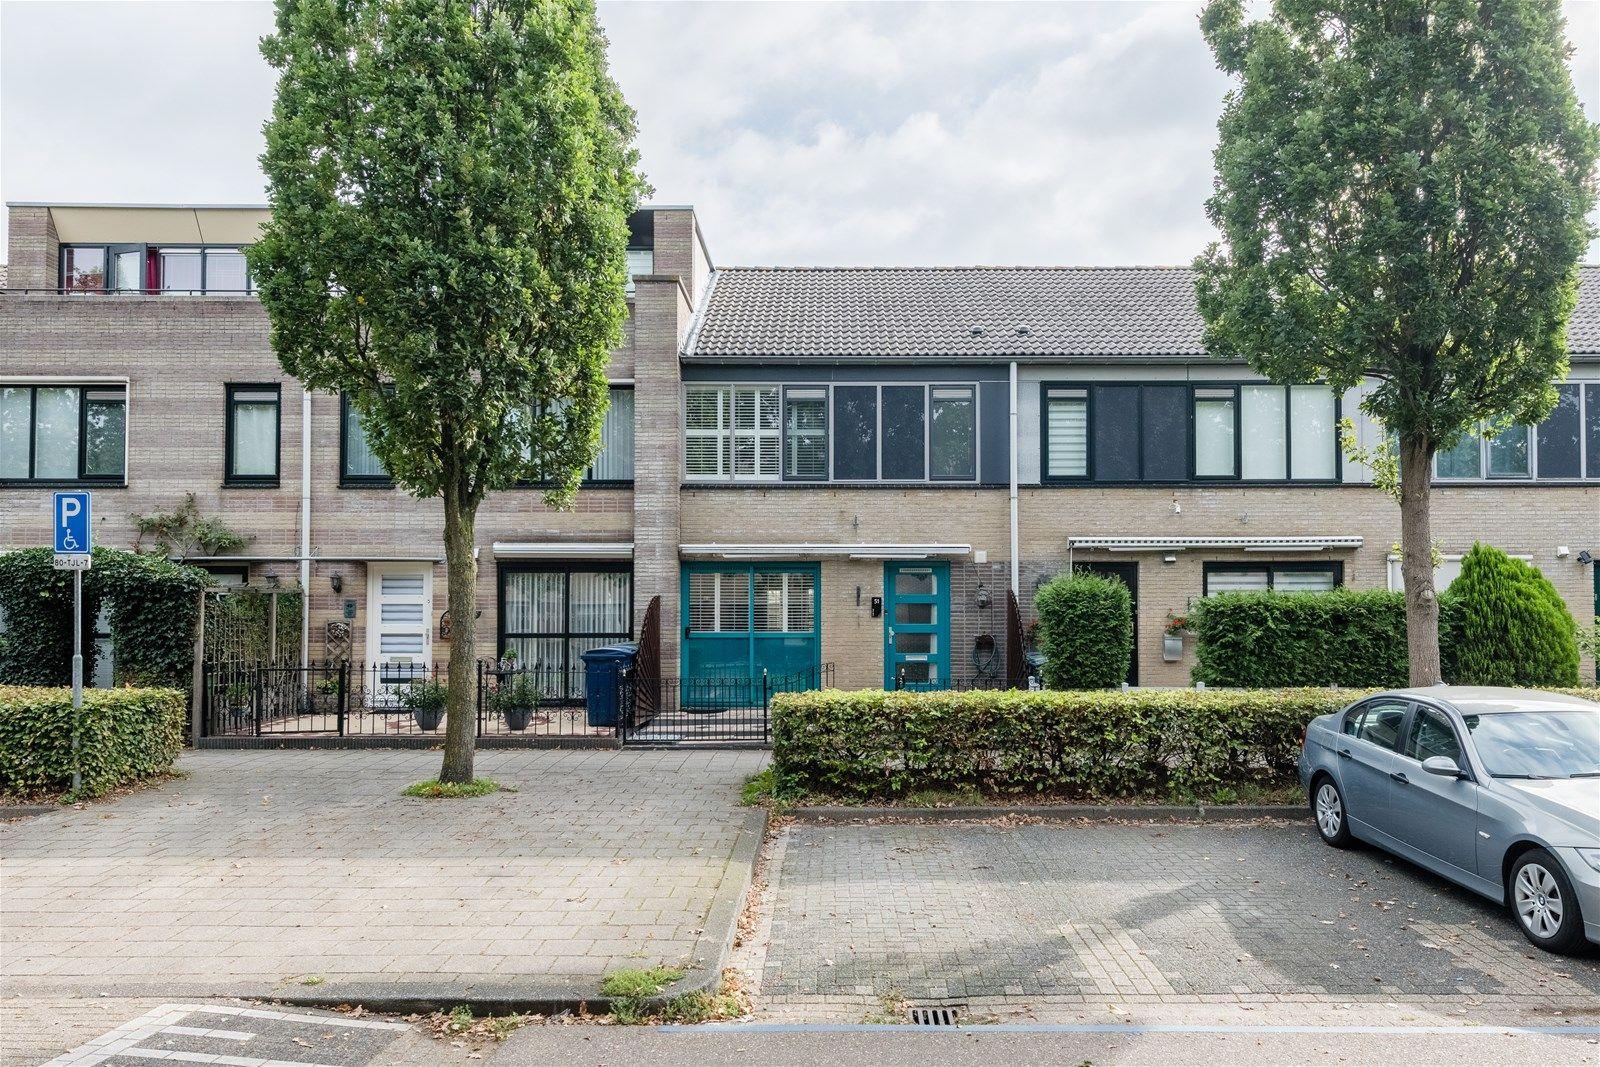 Danny Kayestraat 51, Almere